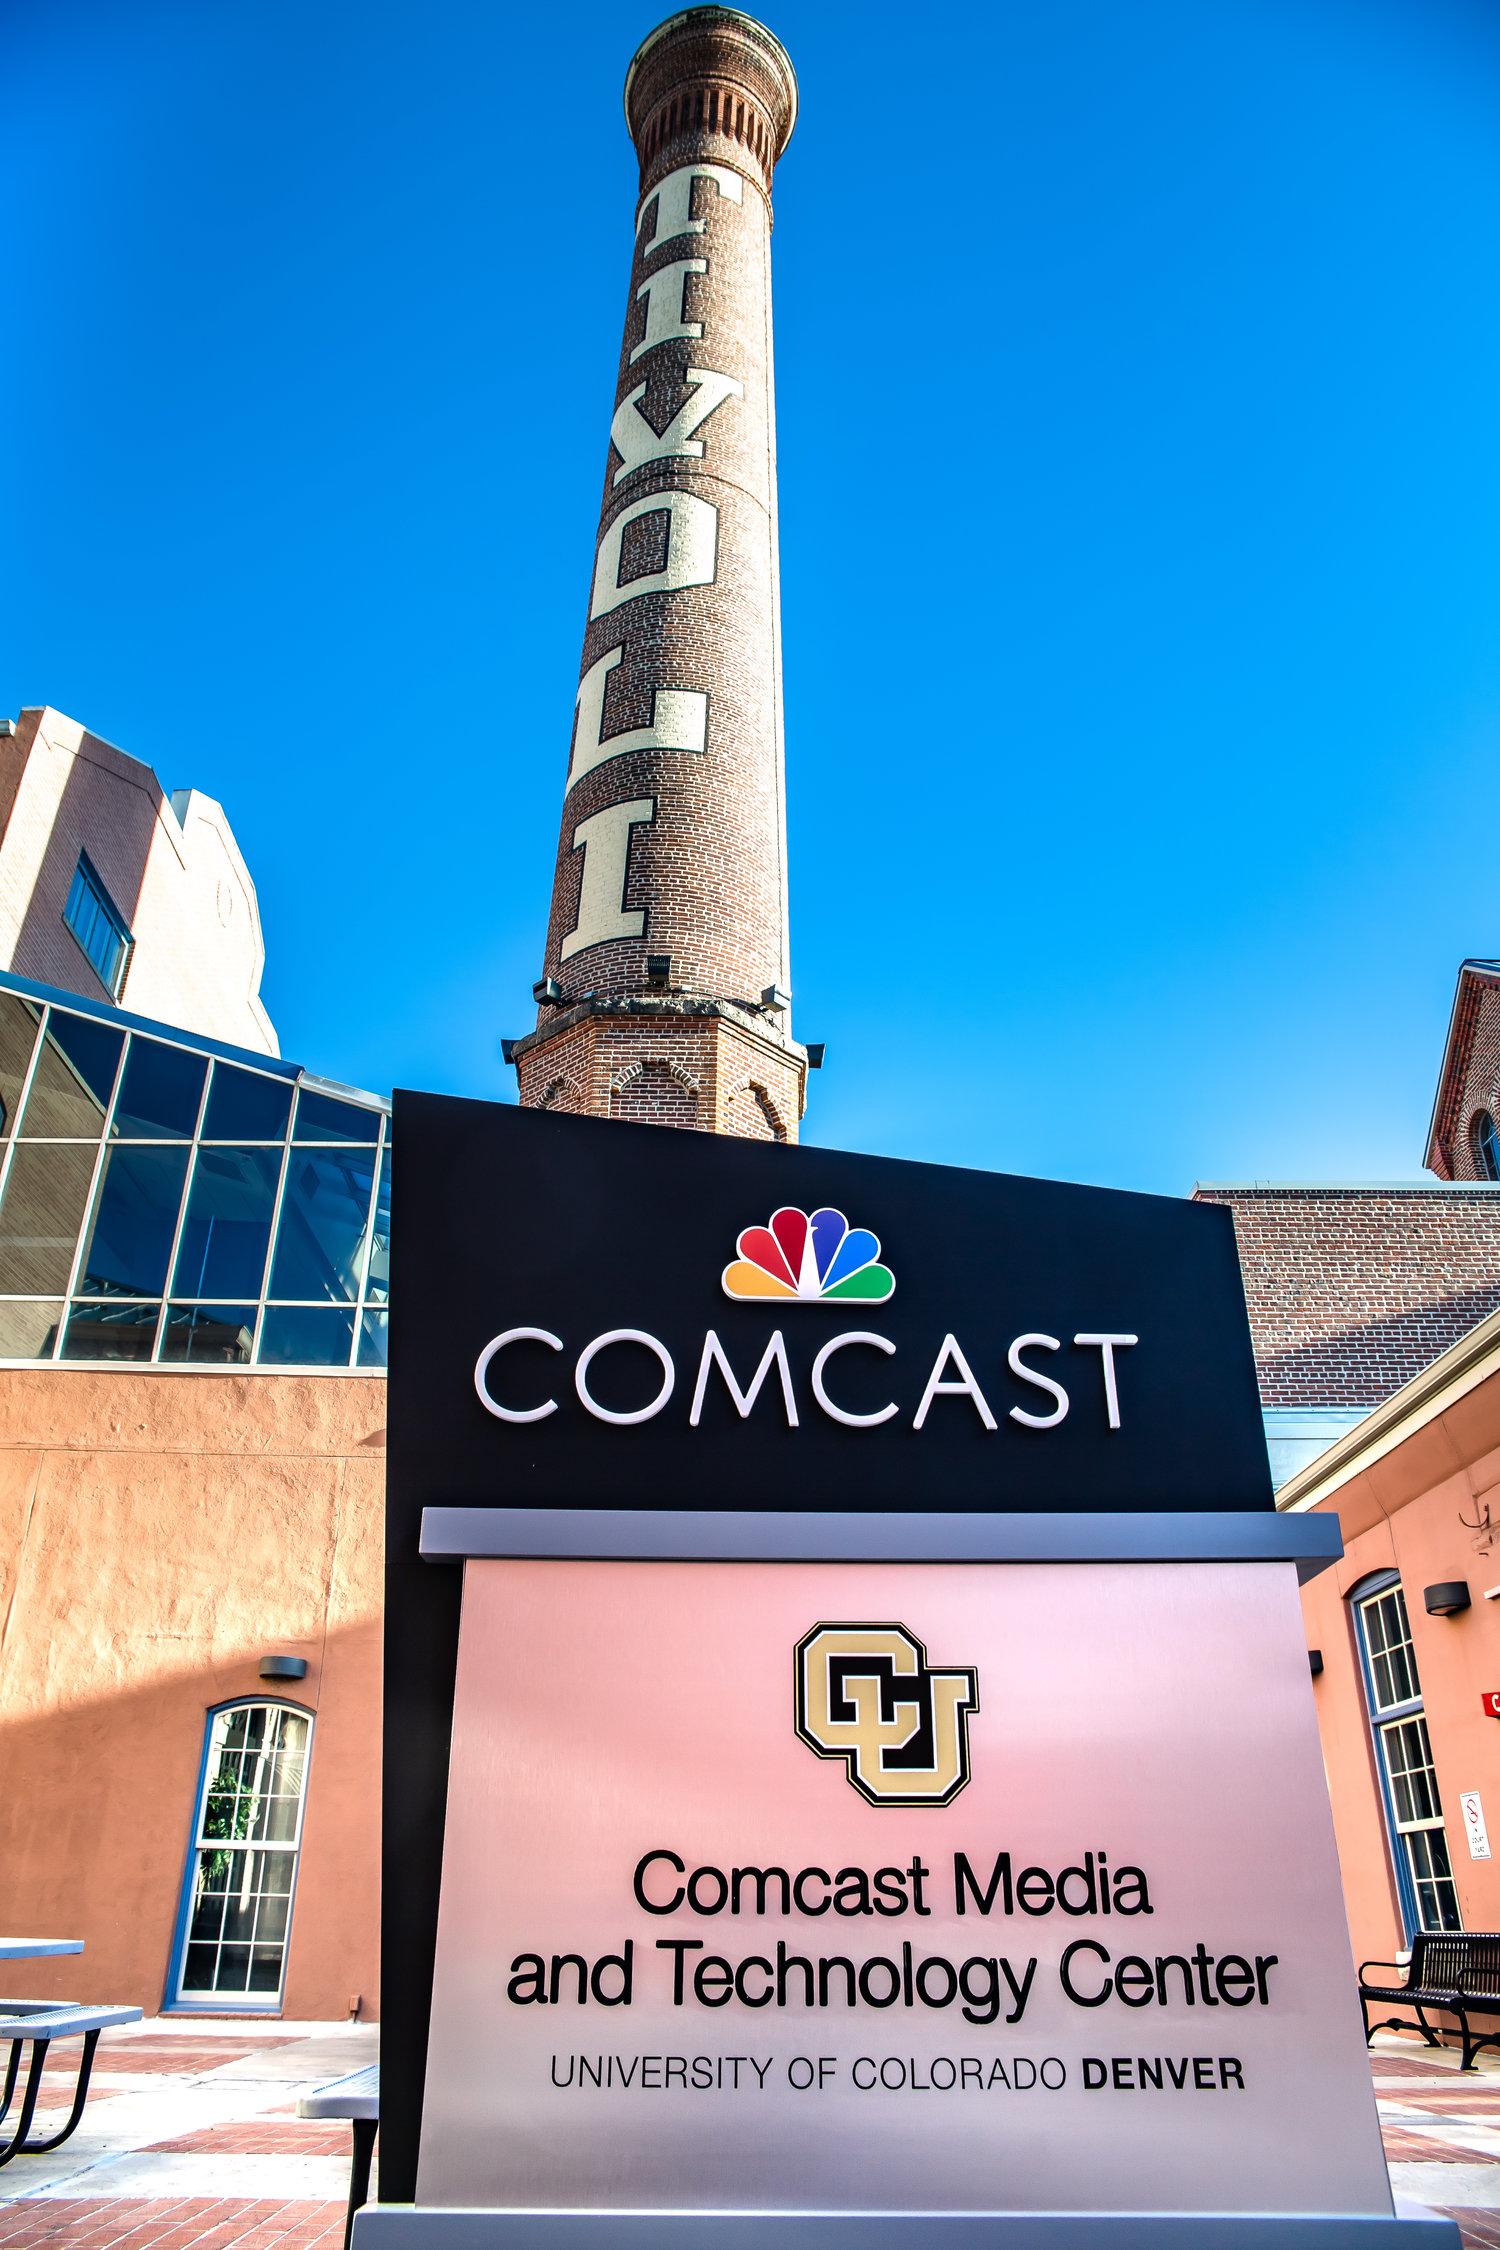 University Of Colorado Denver Campus Map.Contact Comcast Media And Technology Center